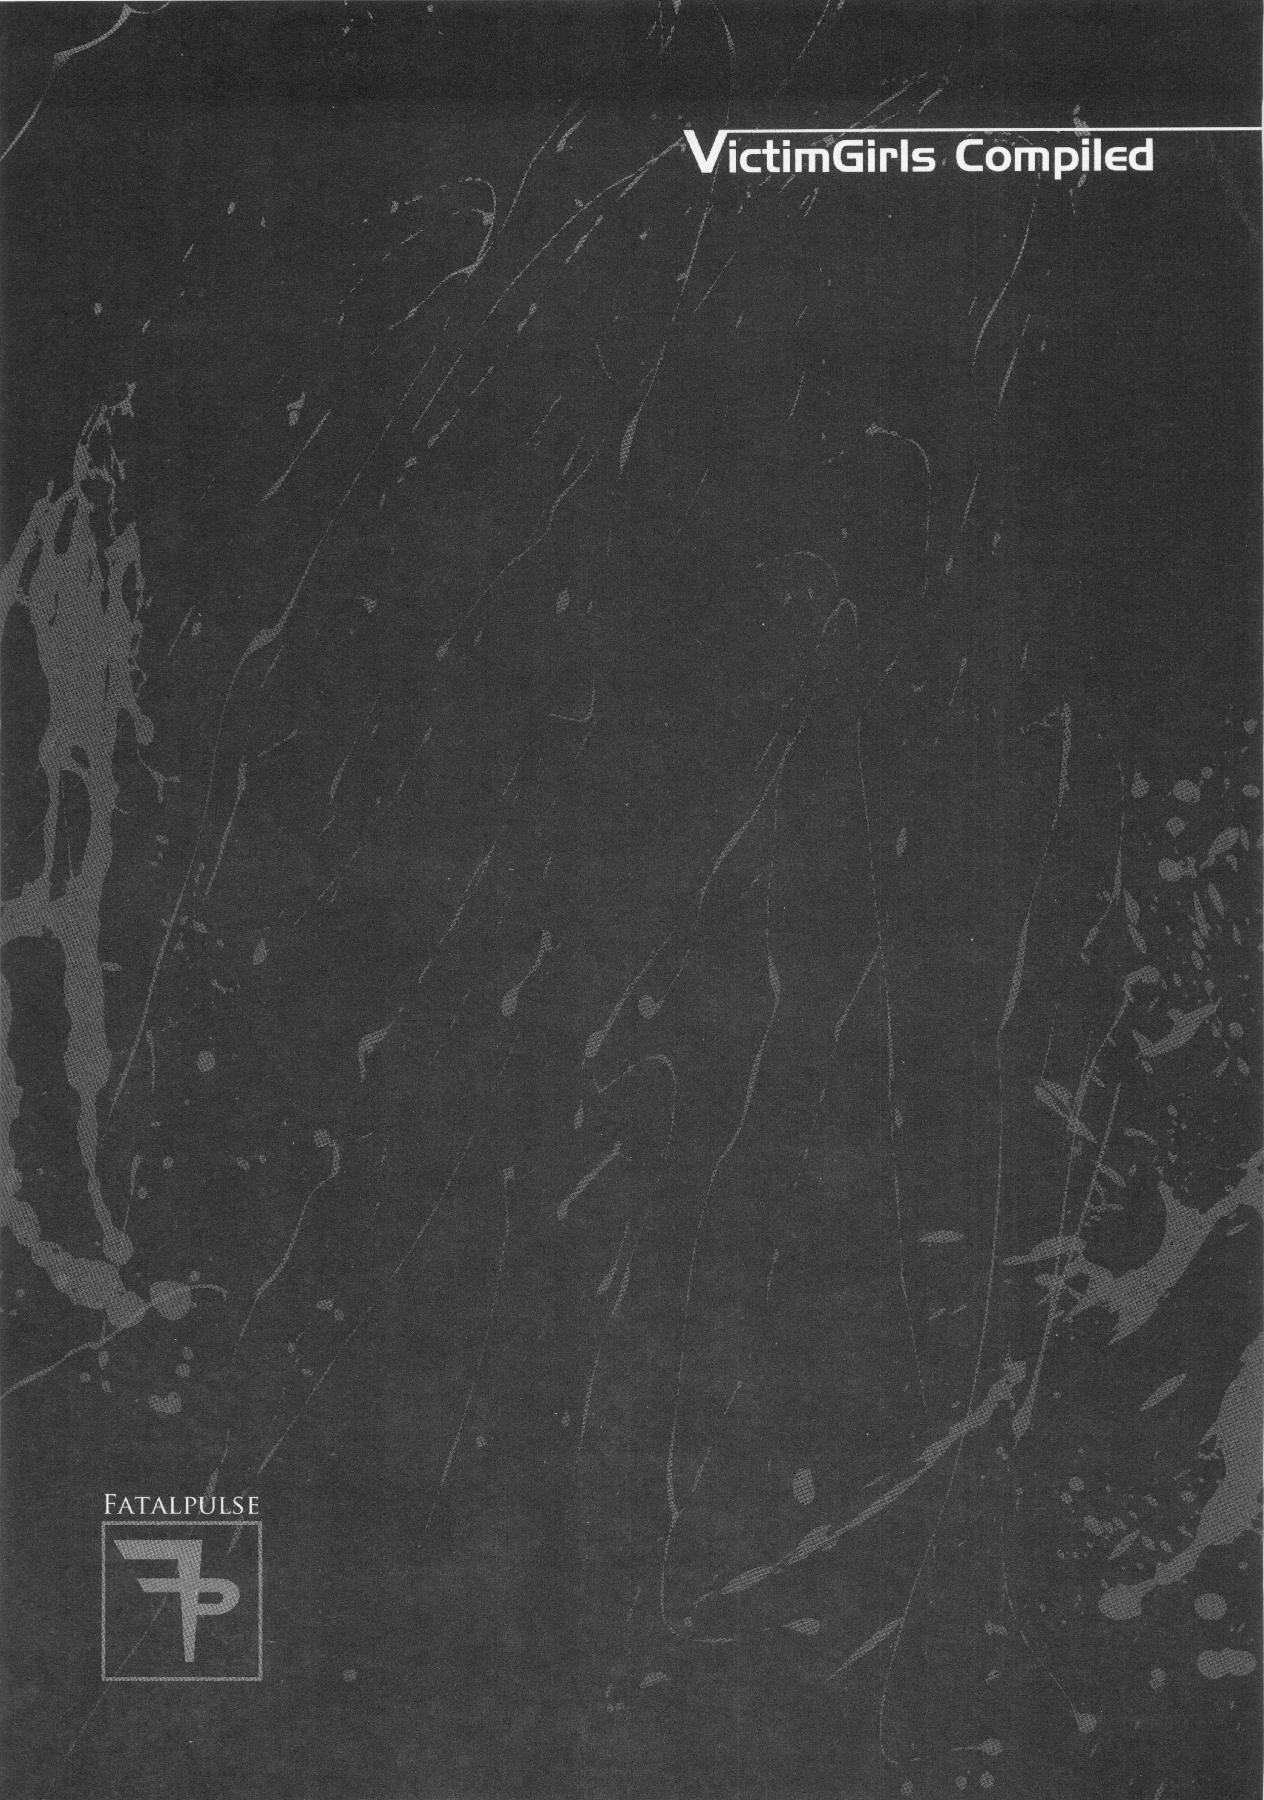 (C83) [Fatalpulse (Asanagi)] VictimGirls Compiled Vol.1 -Victimgirls Soushuuhen 1- MMO Game Selection (Various) 102